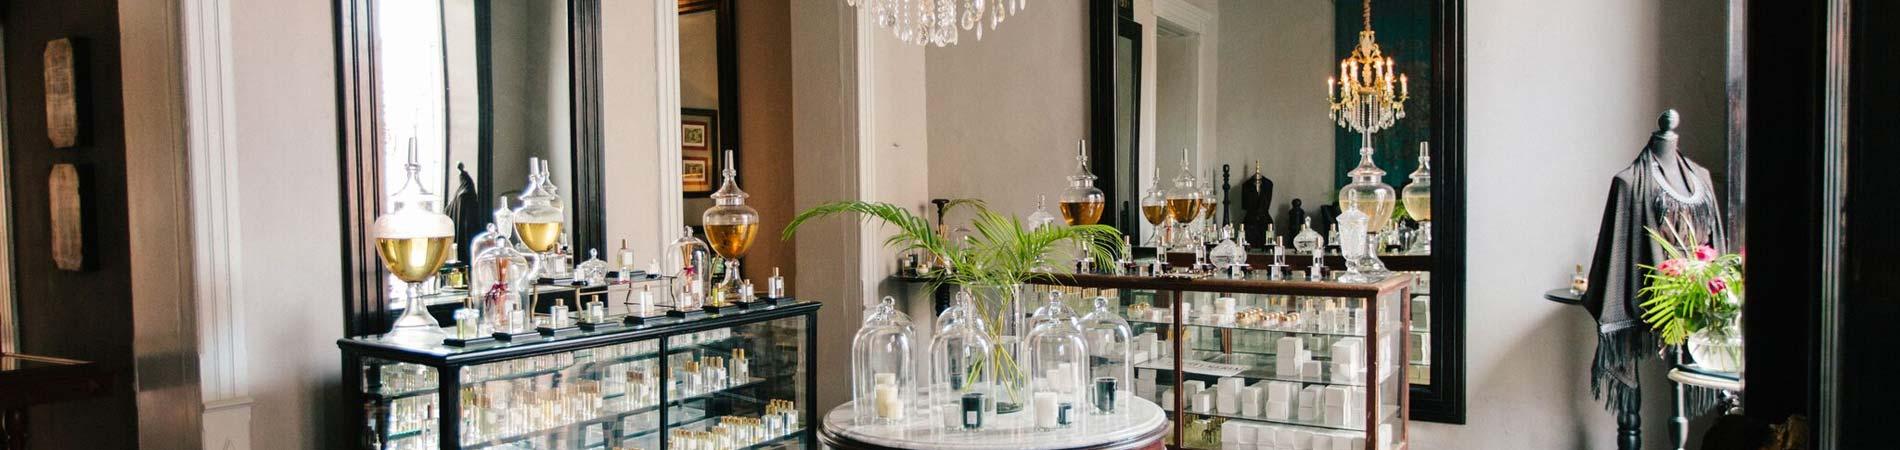 Coqui coqui merida yucatan journey mexico for Hotel luxury merida